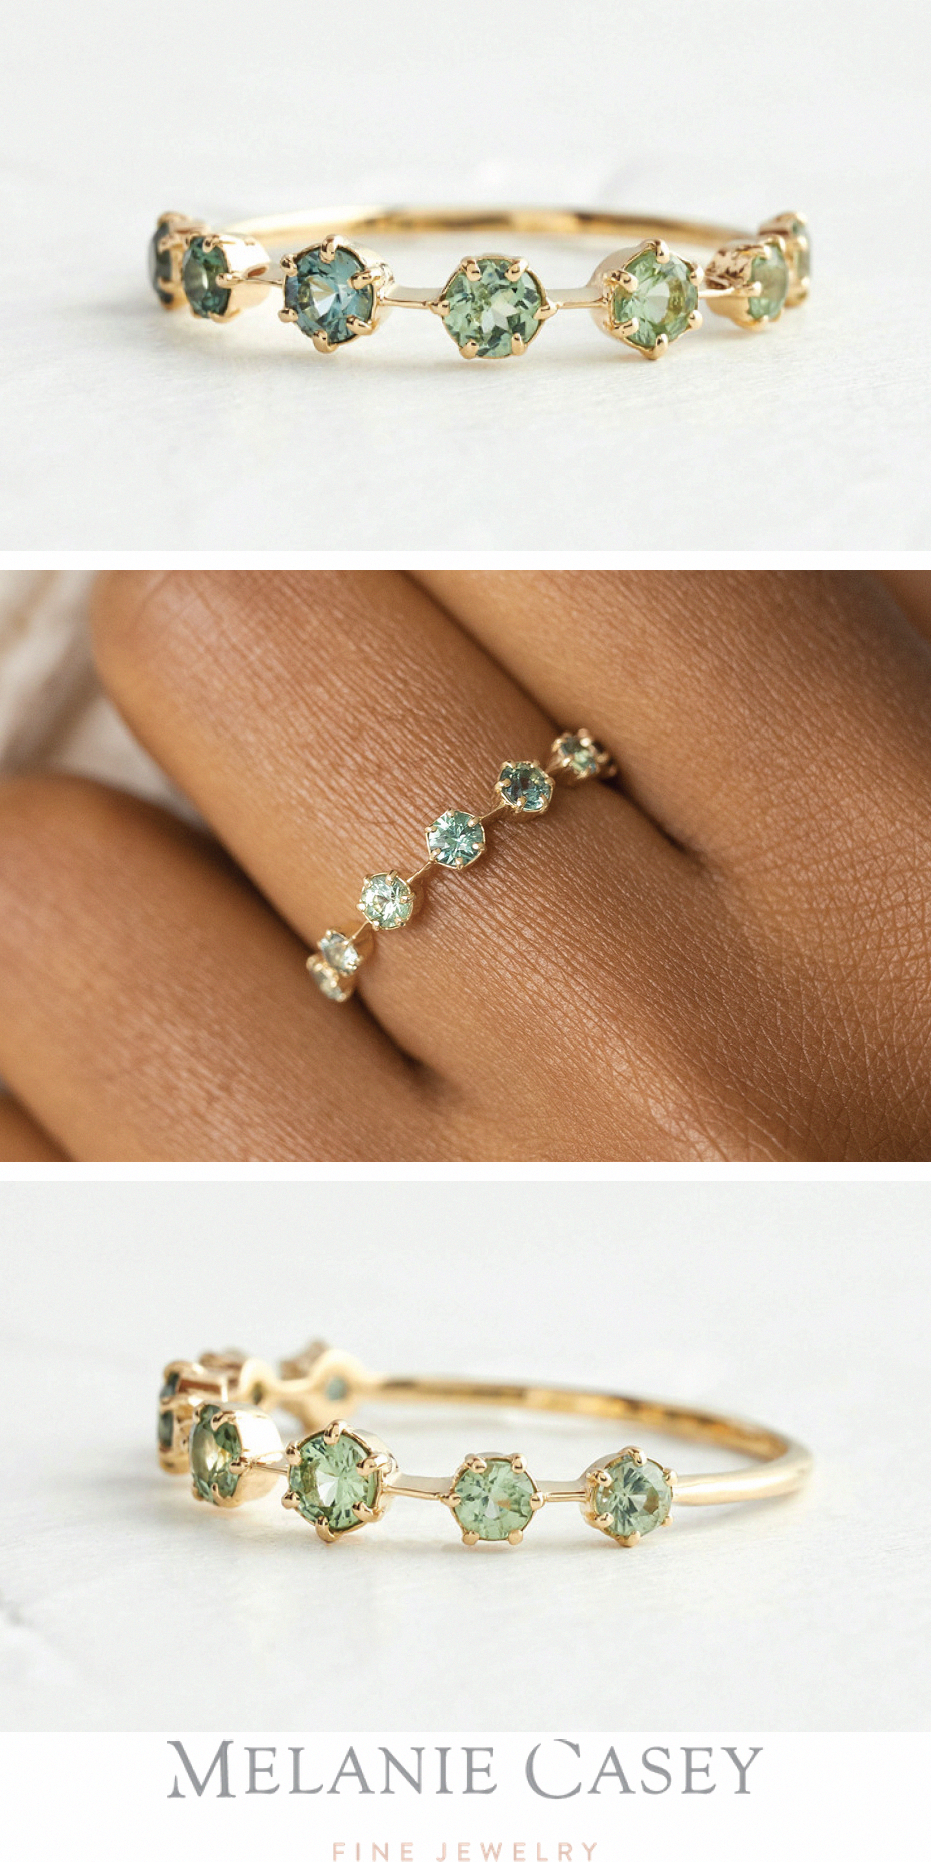 Stunning Labradorite Jewelry Ring * Designer 925 Silver Ring * Pear Shape Ring * Gemstone Ring * Stylish